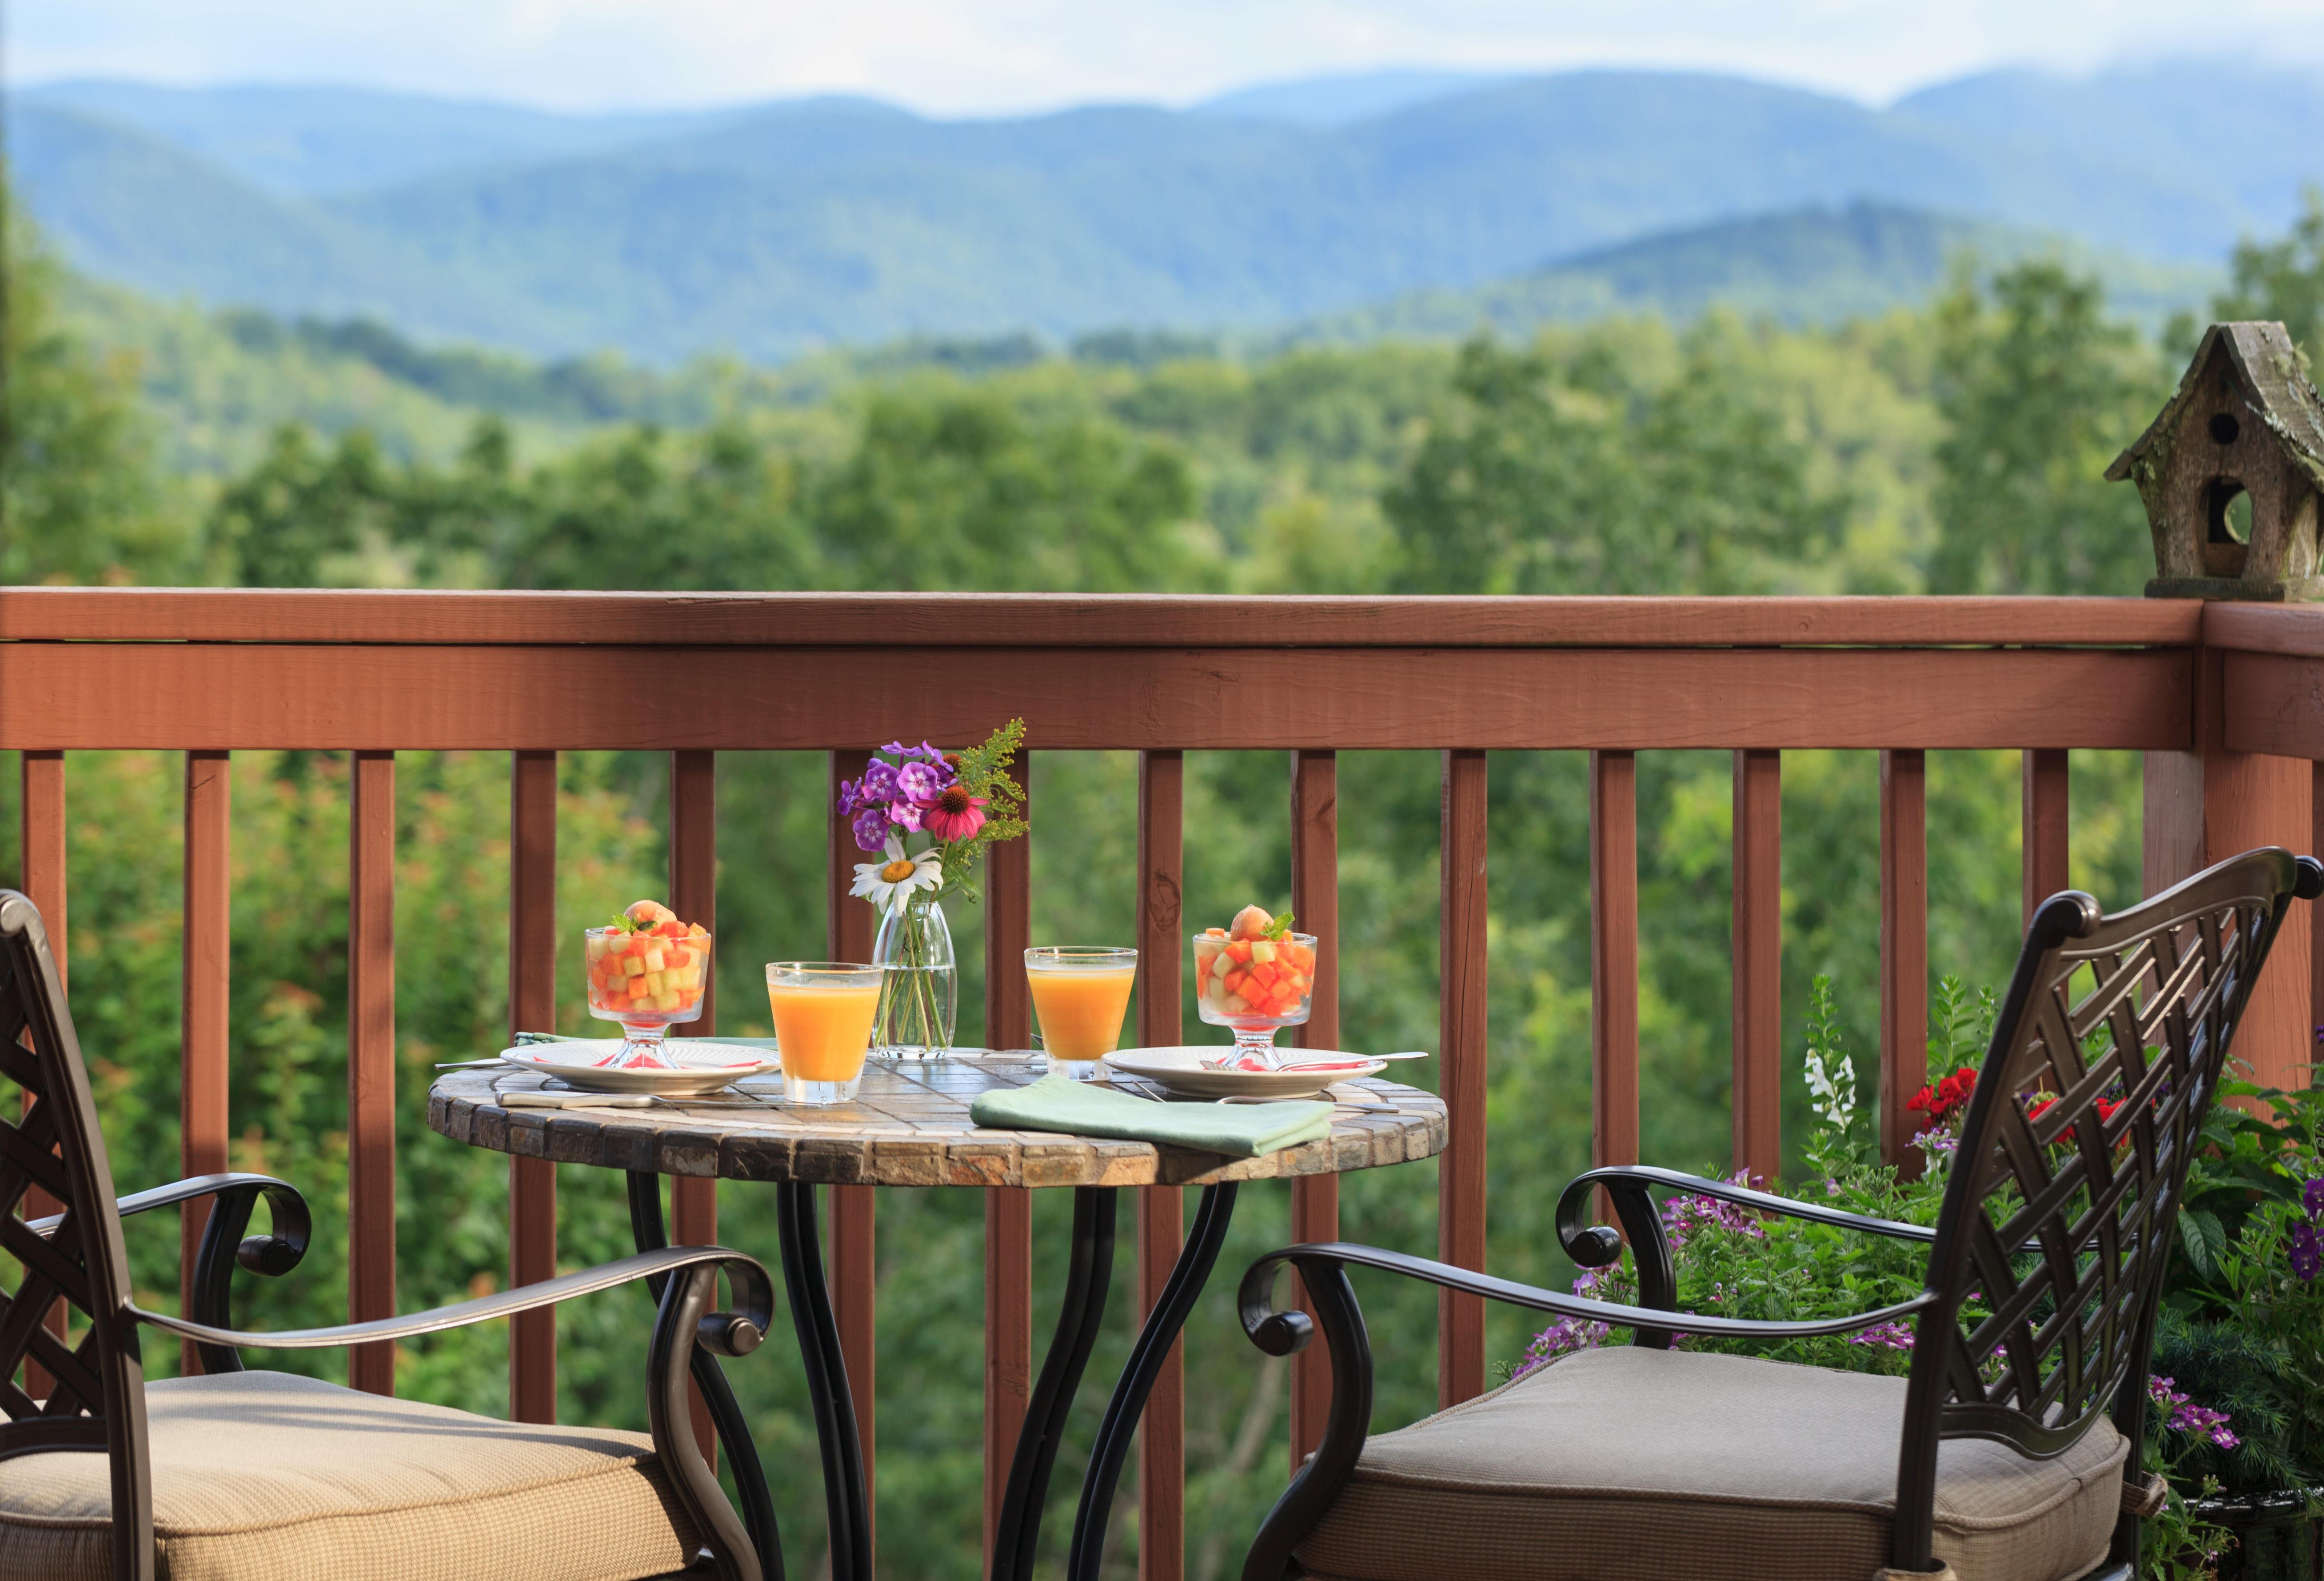 lucille's mountain top inn & spa | official georgia tourism & travel